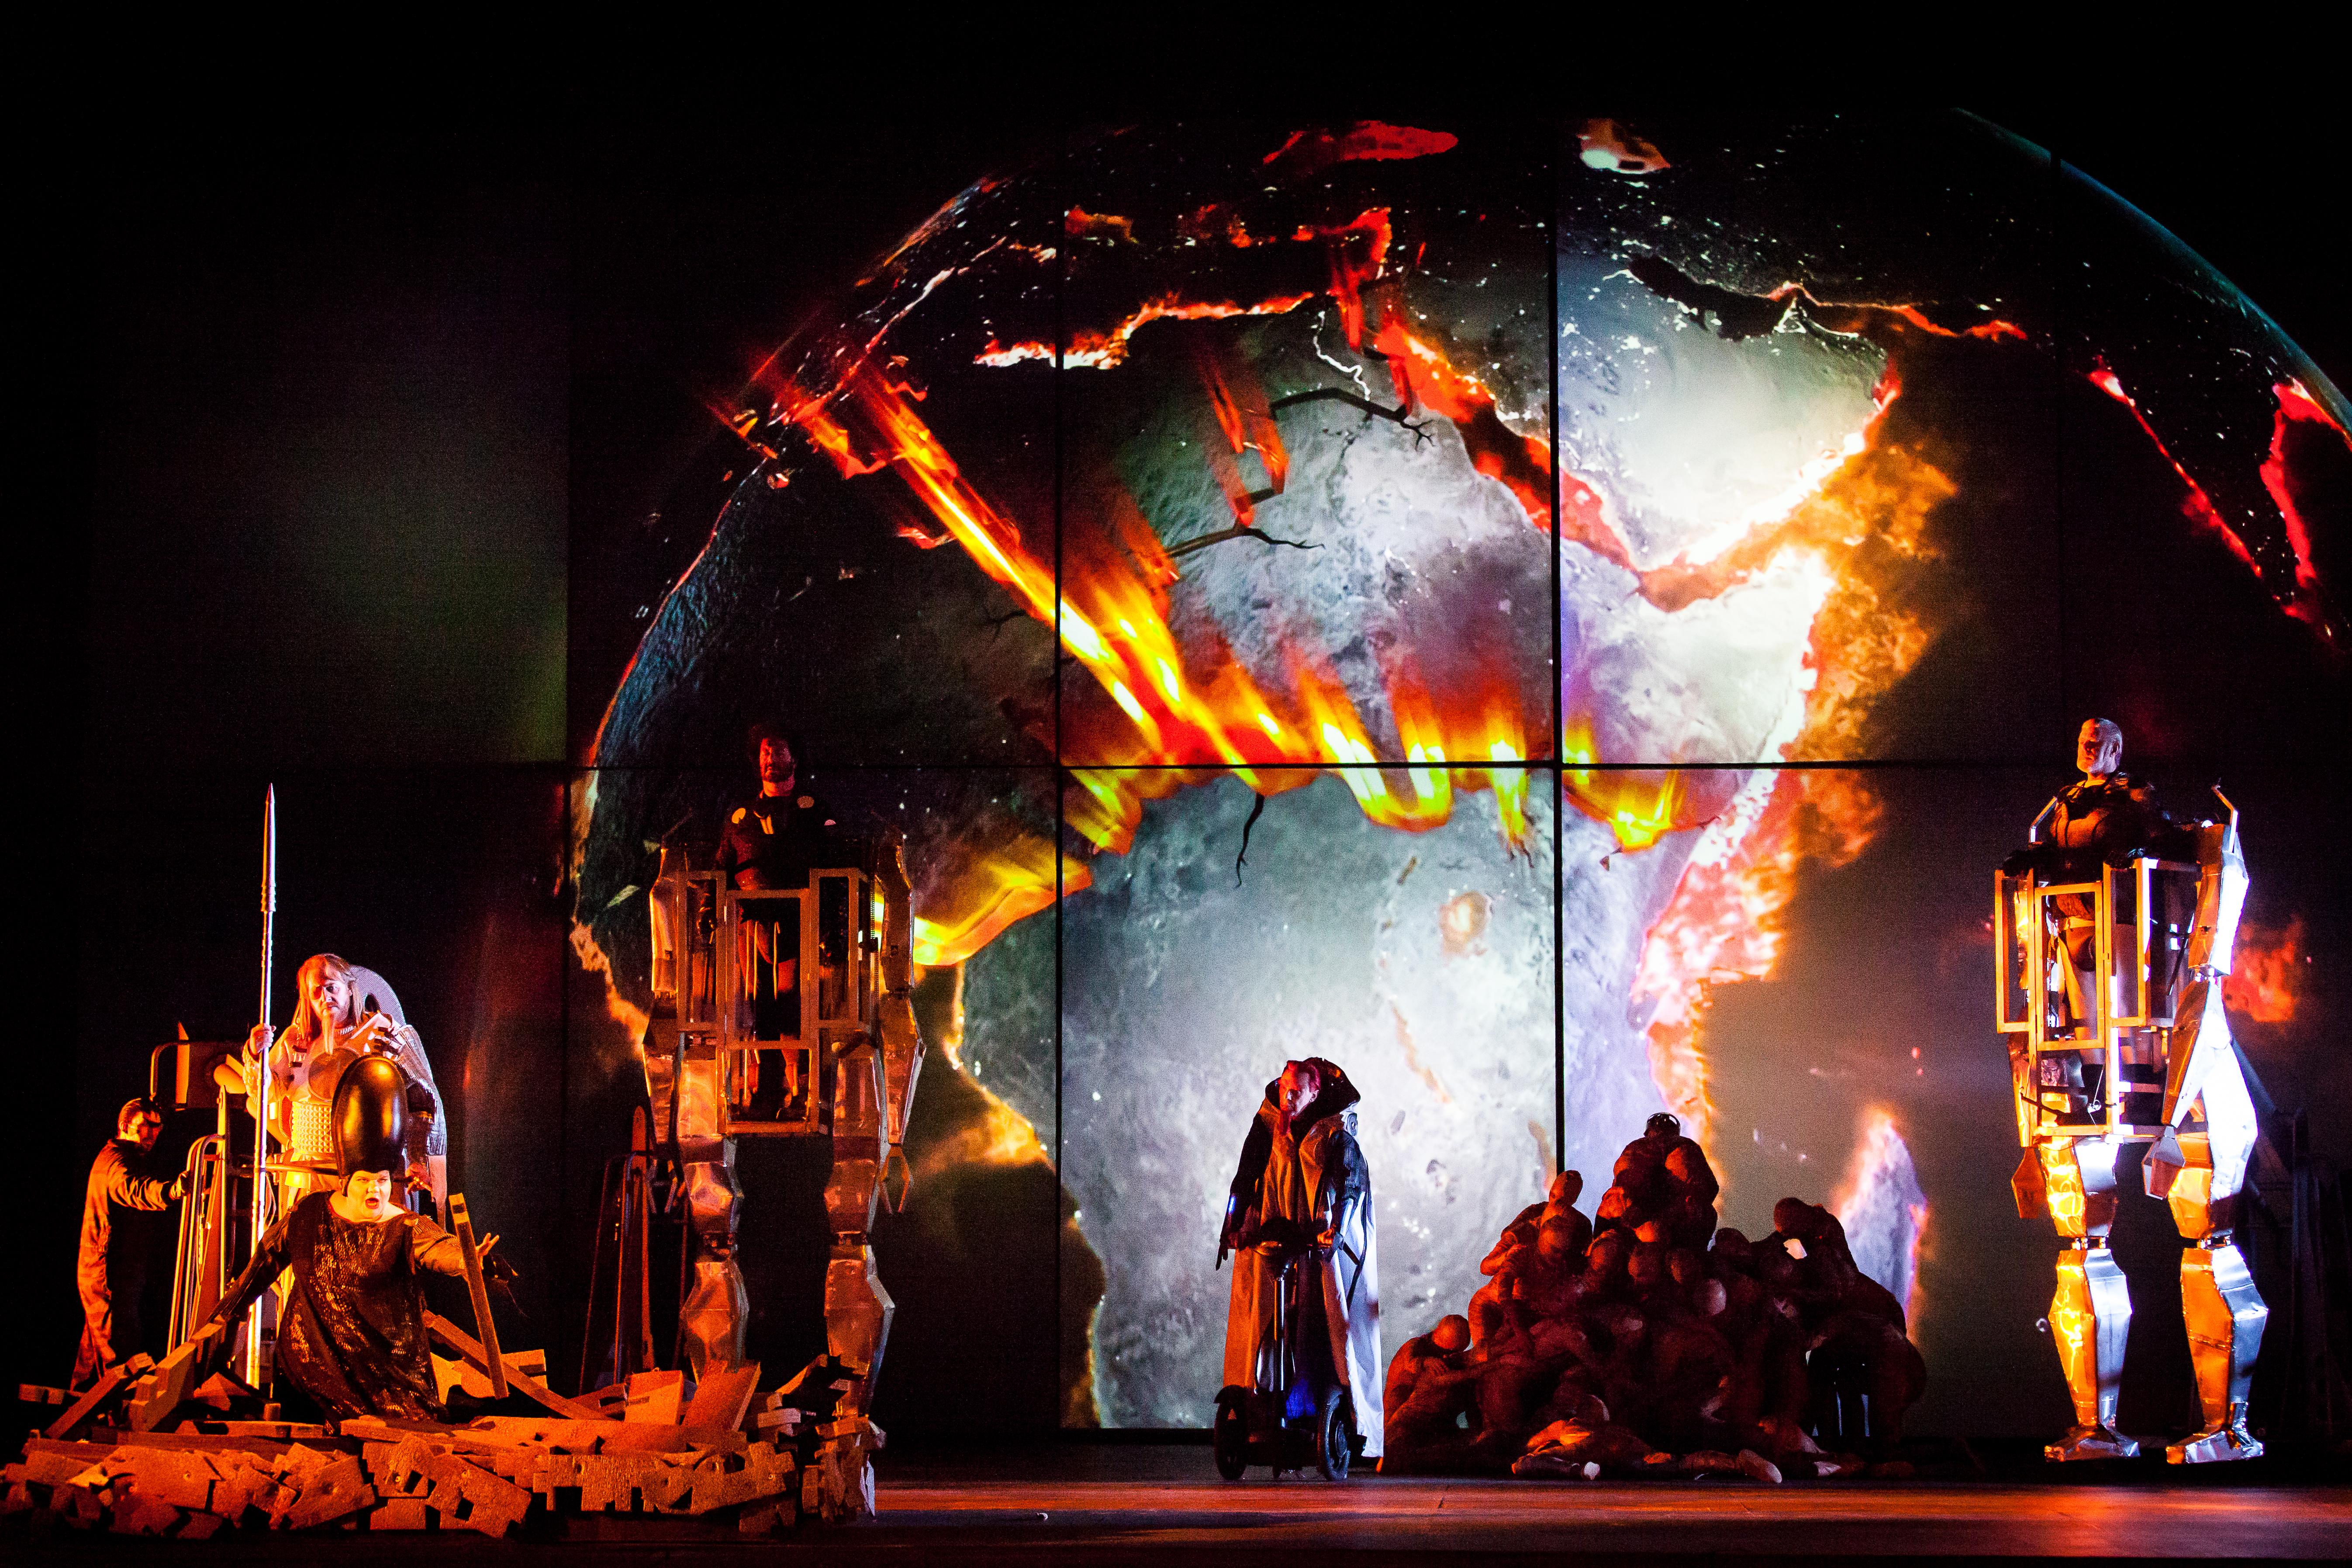 BWW Reviews: Houston Grand Opera's DAS RHEINGOLD is Full-Throttle Spectacle